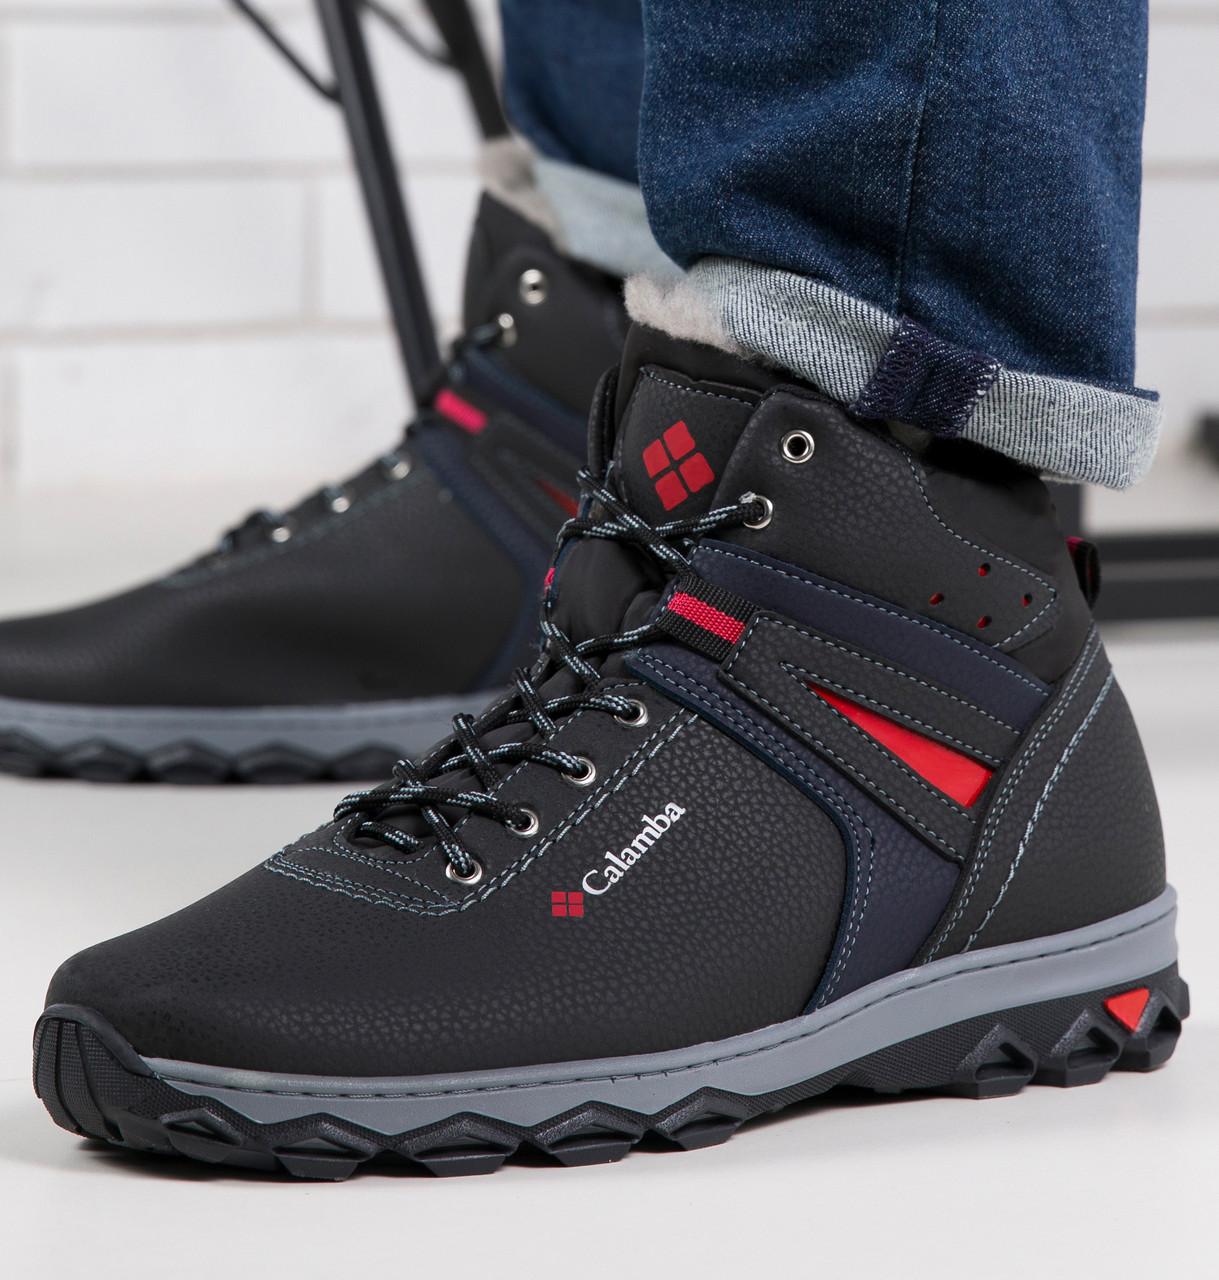 Ботинки мужские зимние 40р